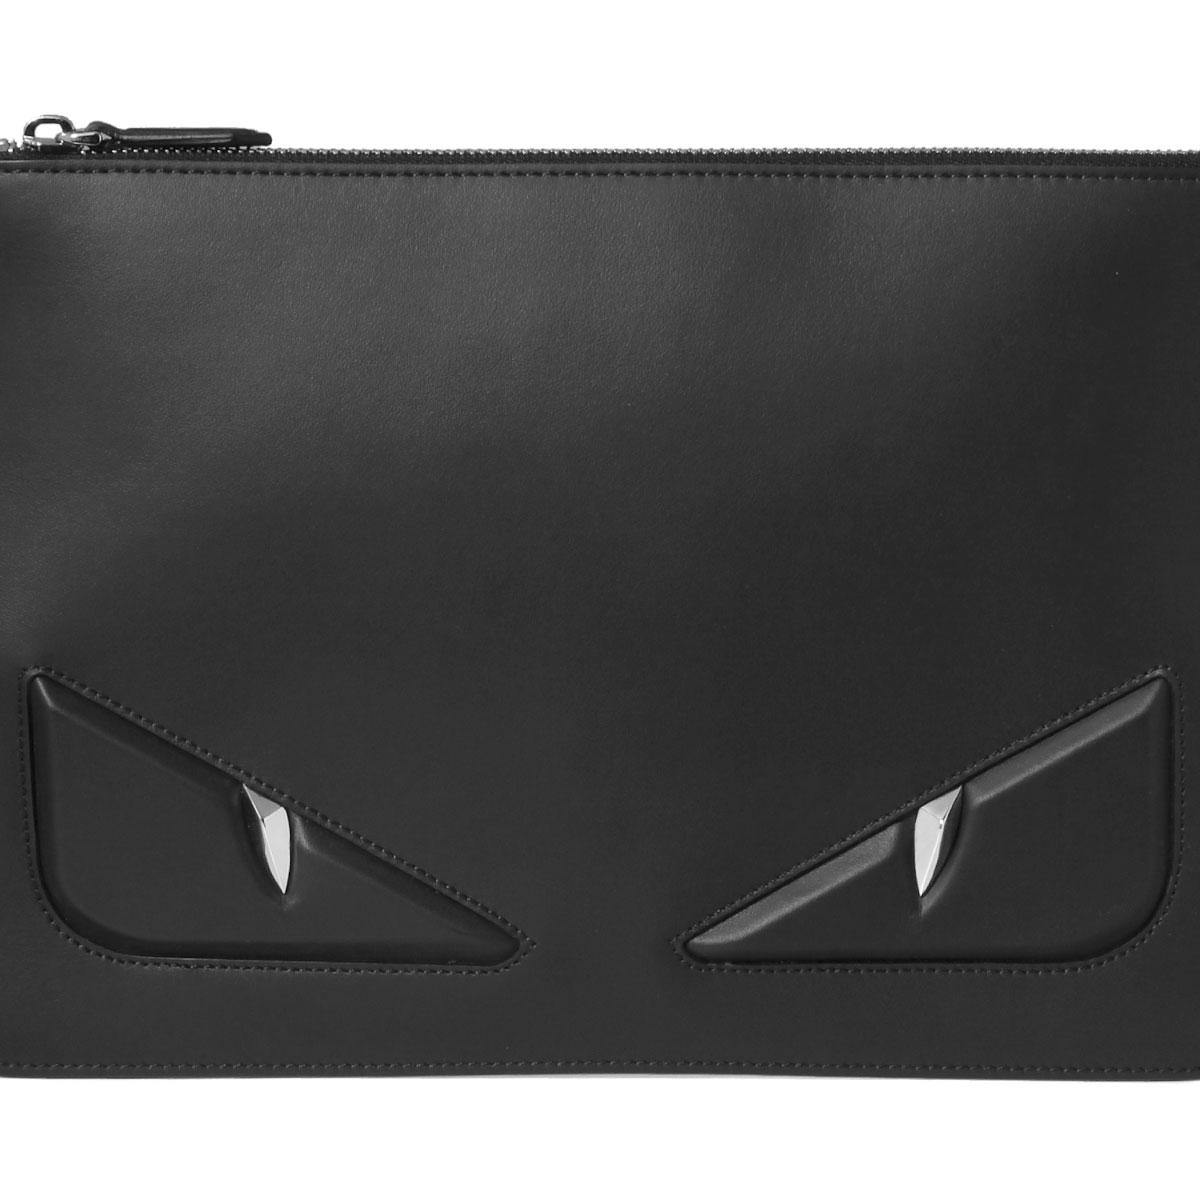 d03ce2d5fe01 importshopdouble  Fendi FENDI bag men 7N0078 O76 F0GXN clutch bag ...